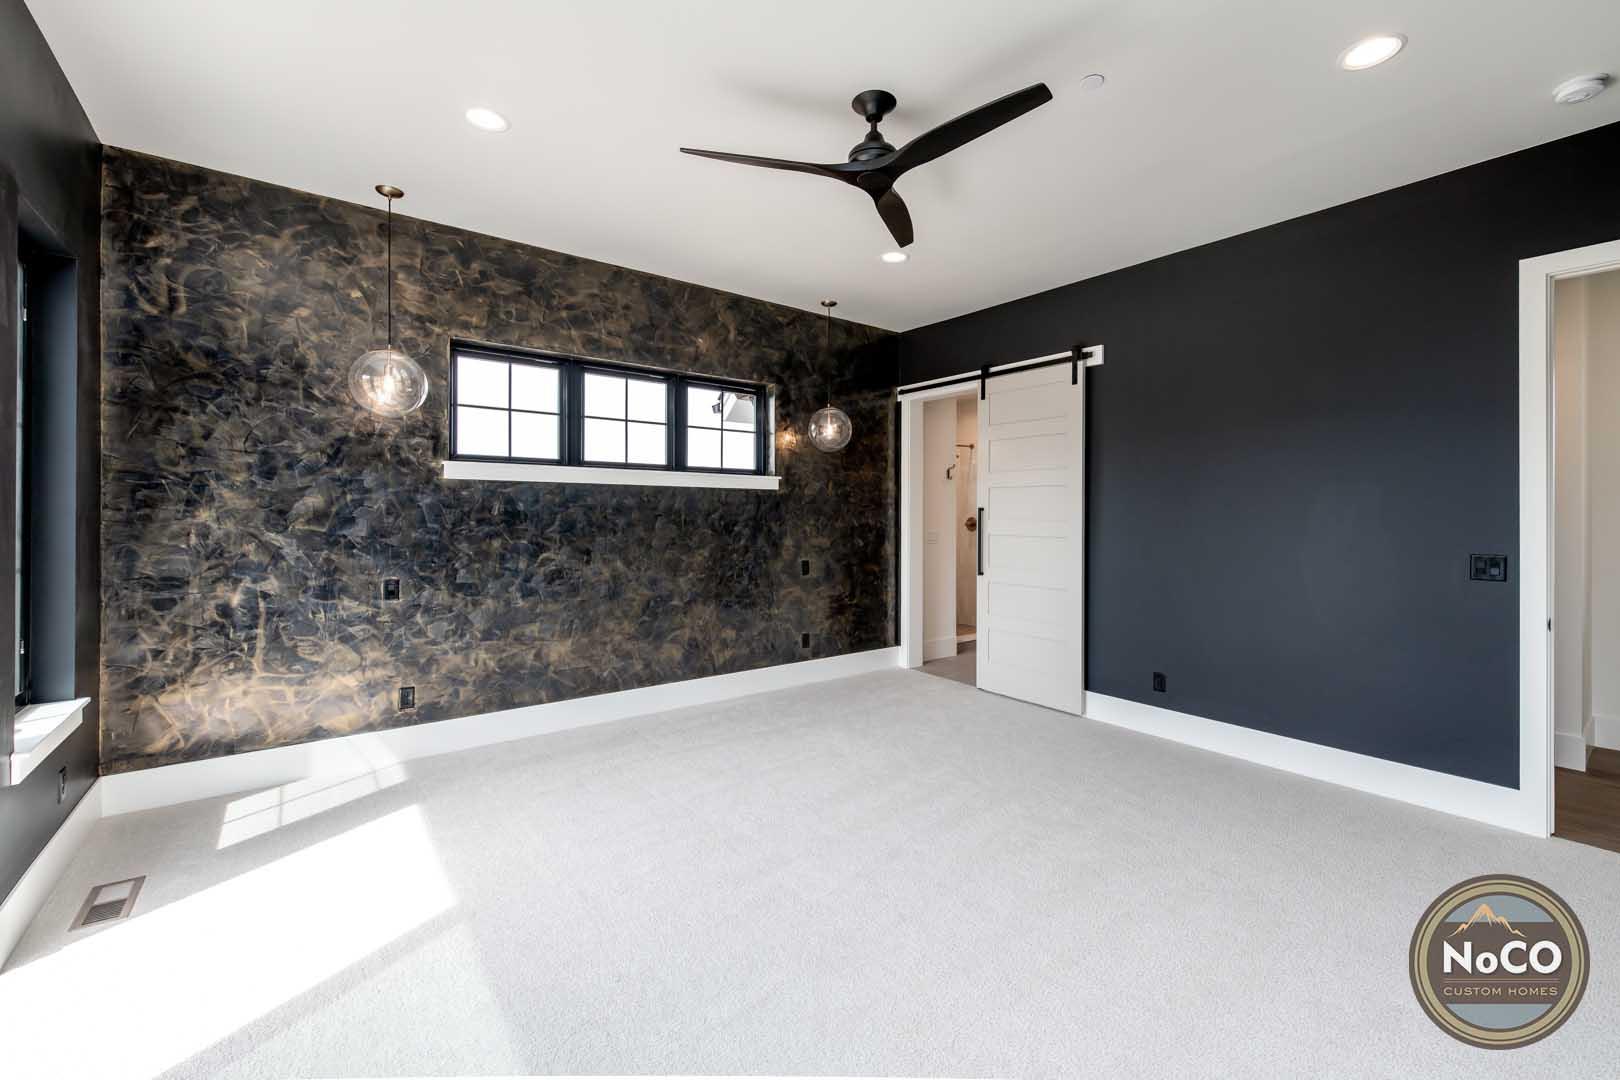 colorado custom home master bedroom accent wall